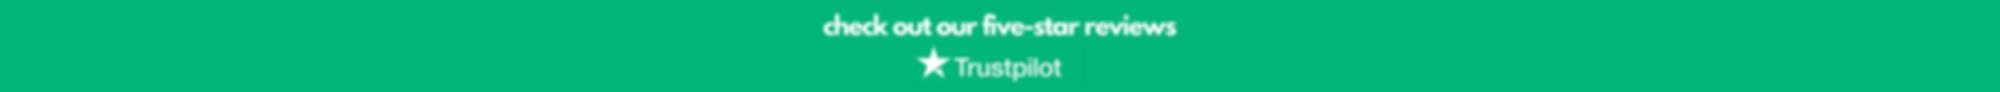 trustpilot-workoutaway